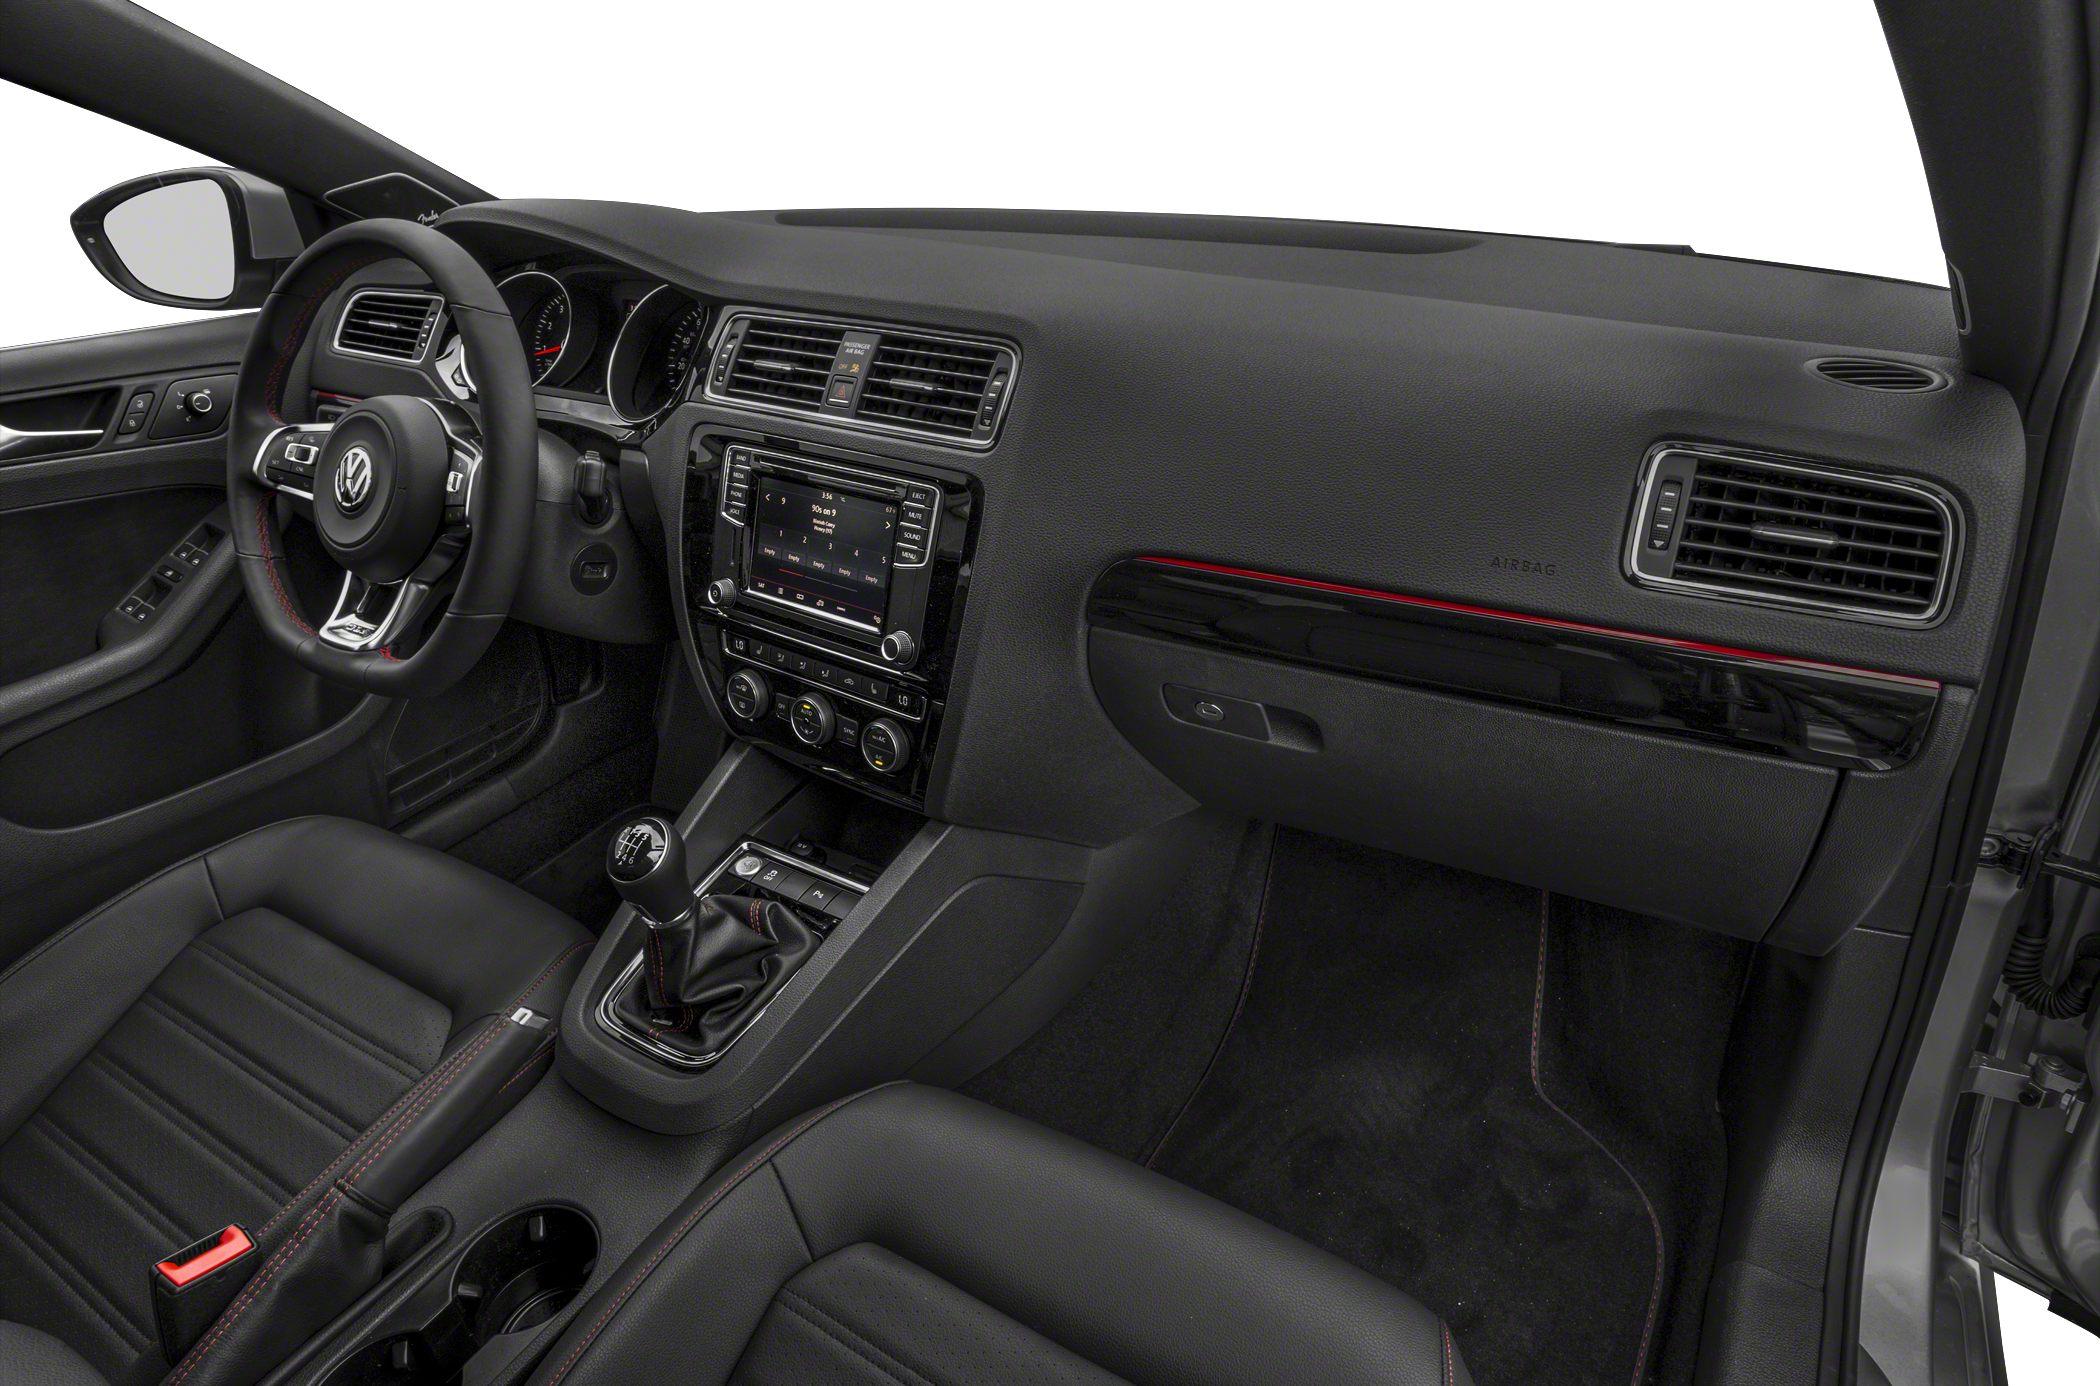 2018 Volkswagen Jetta Styles & Features Highlights